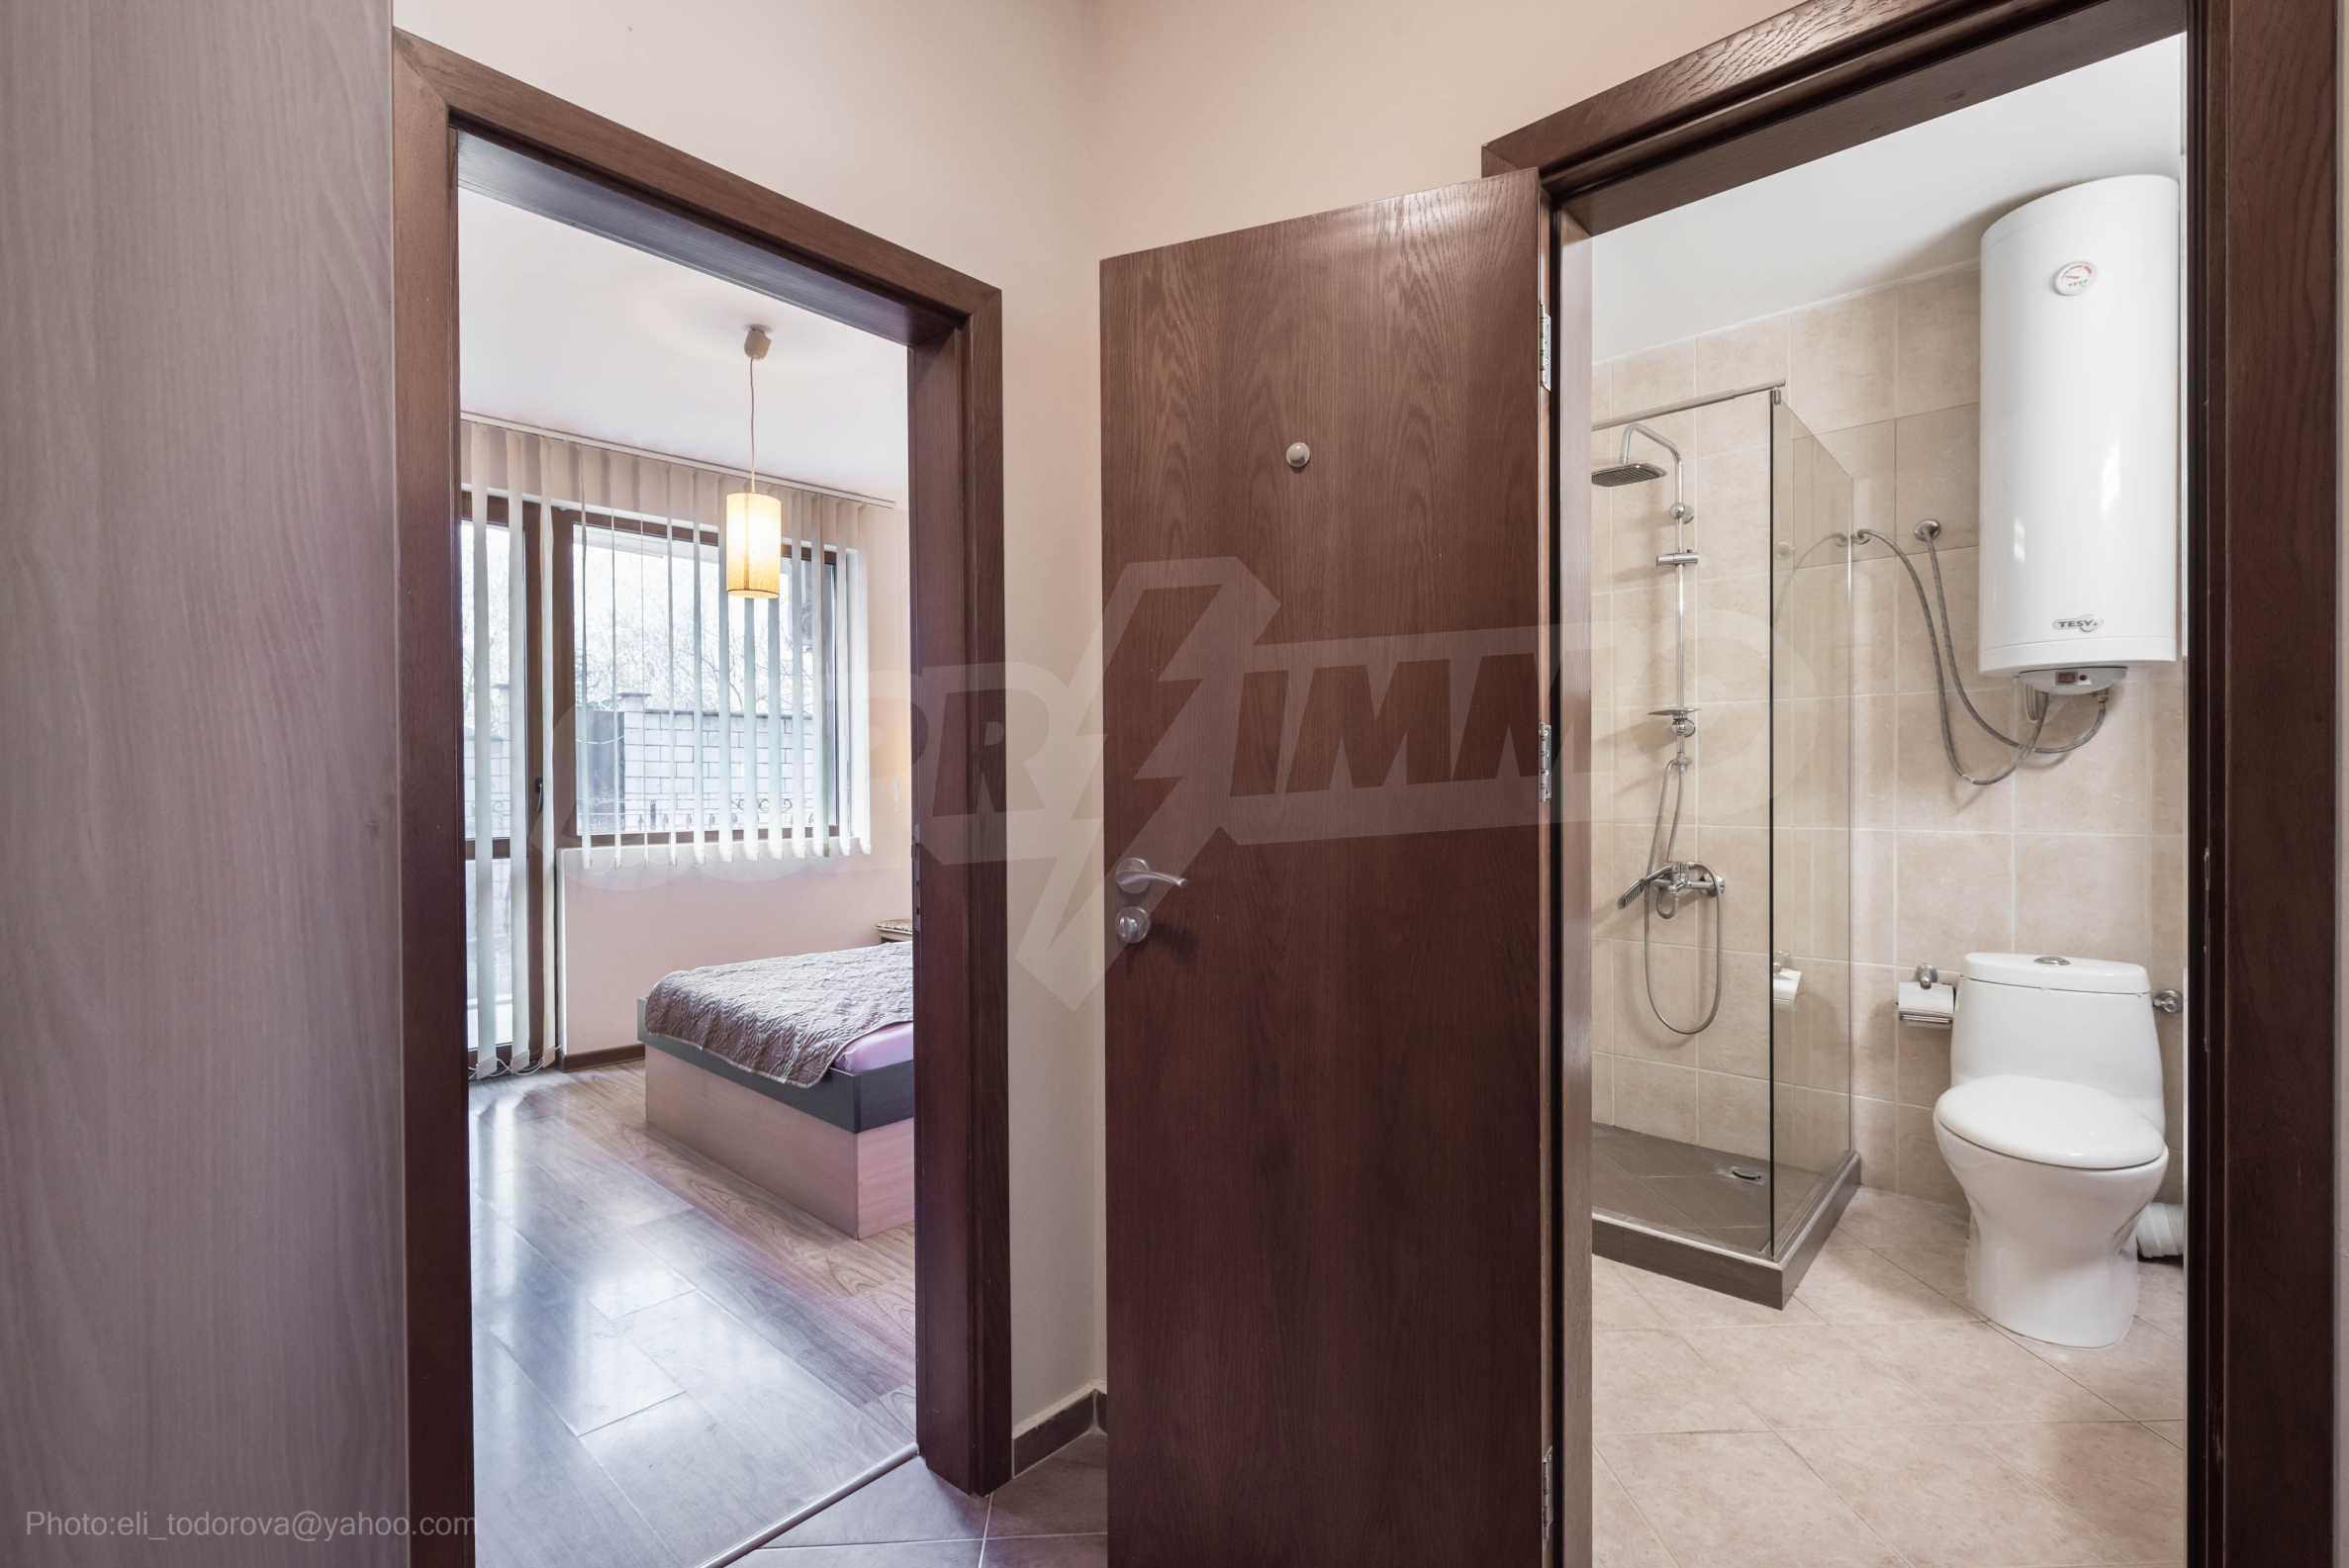 Квартира в аренду в Варне 14